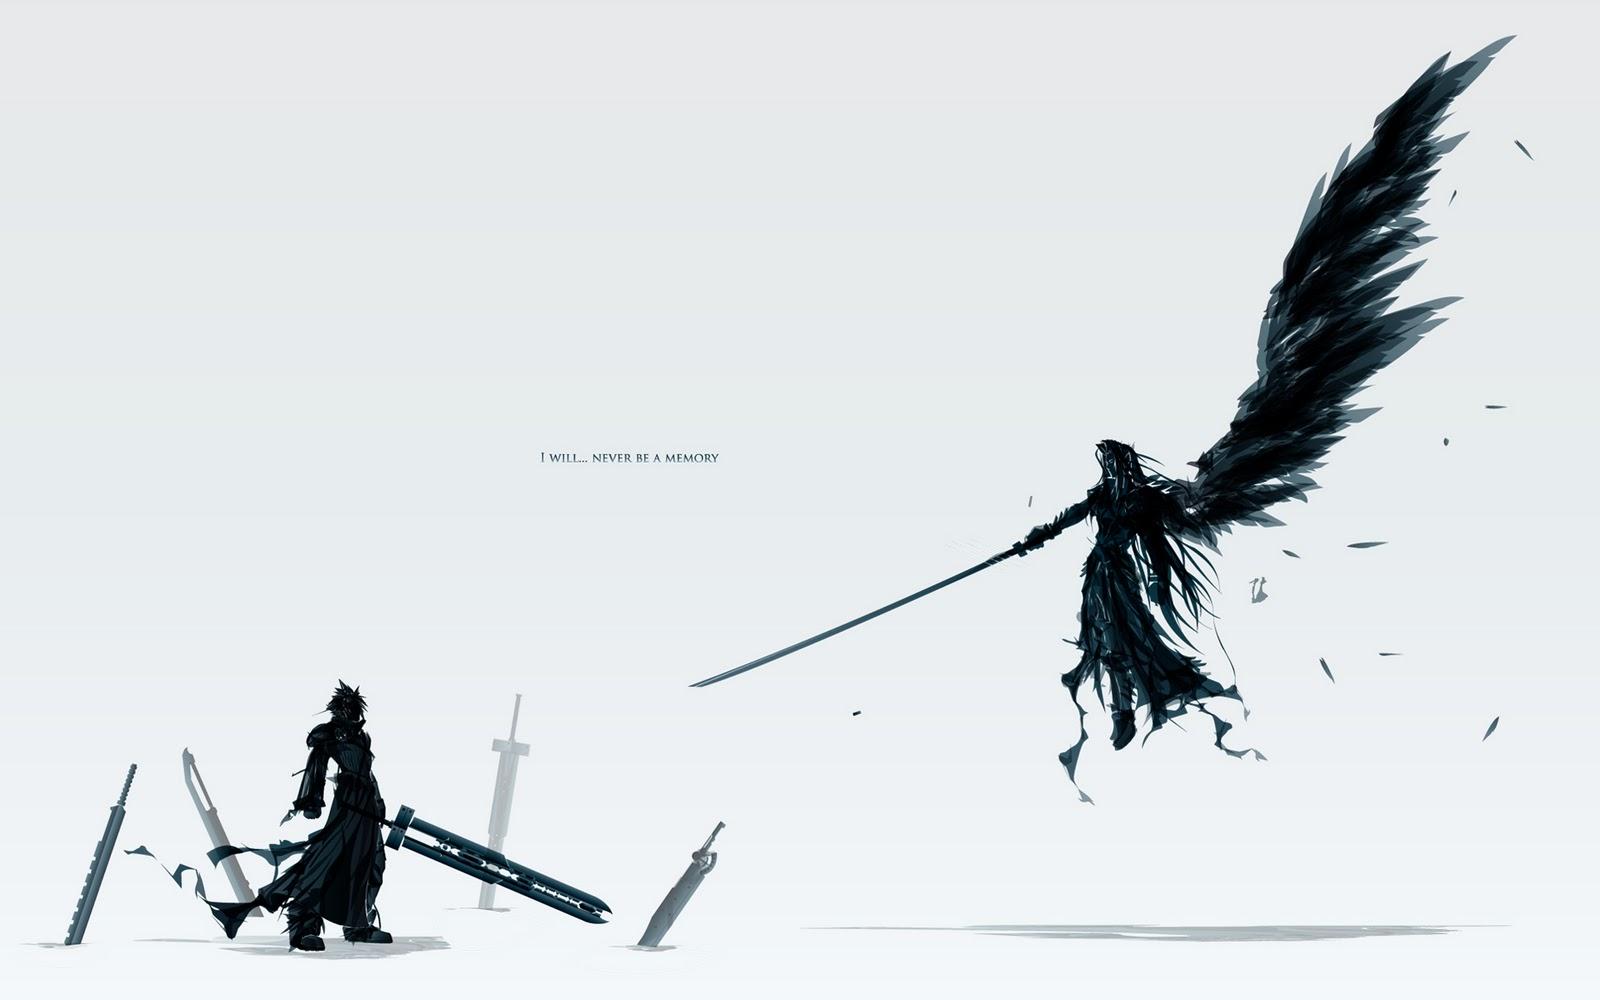 Final Fantasy HD Wallpaper Final Fantasy VII Advent Children Complete 1600x1000